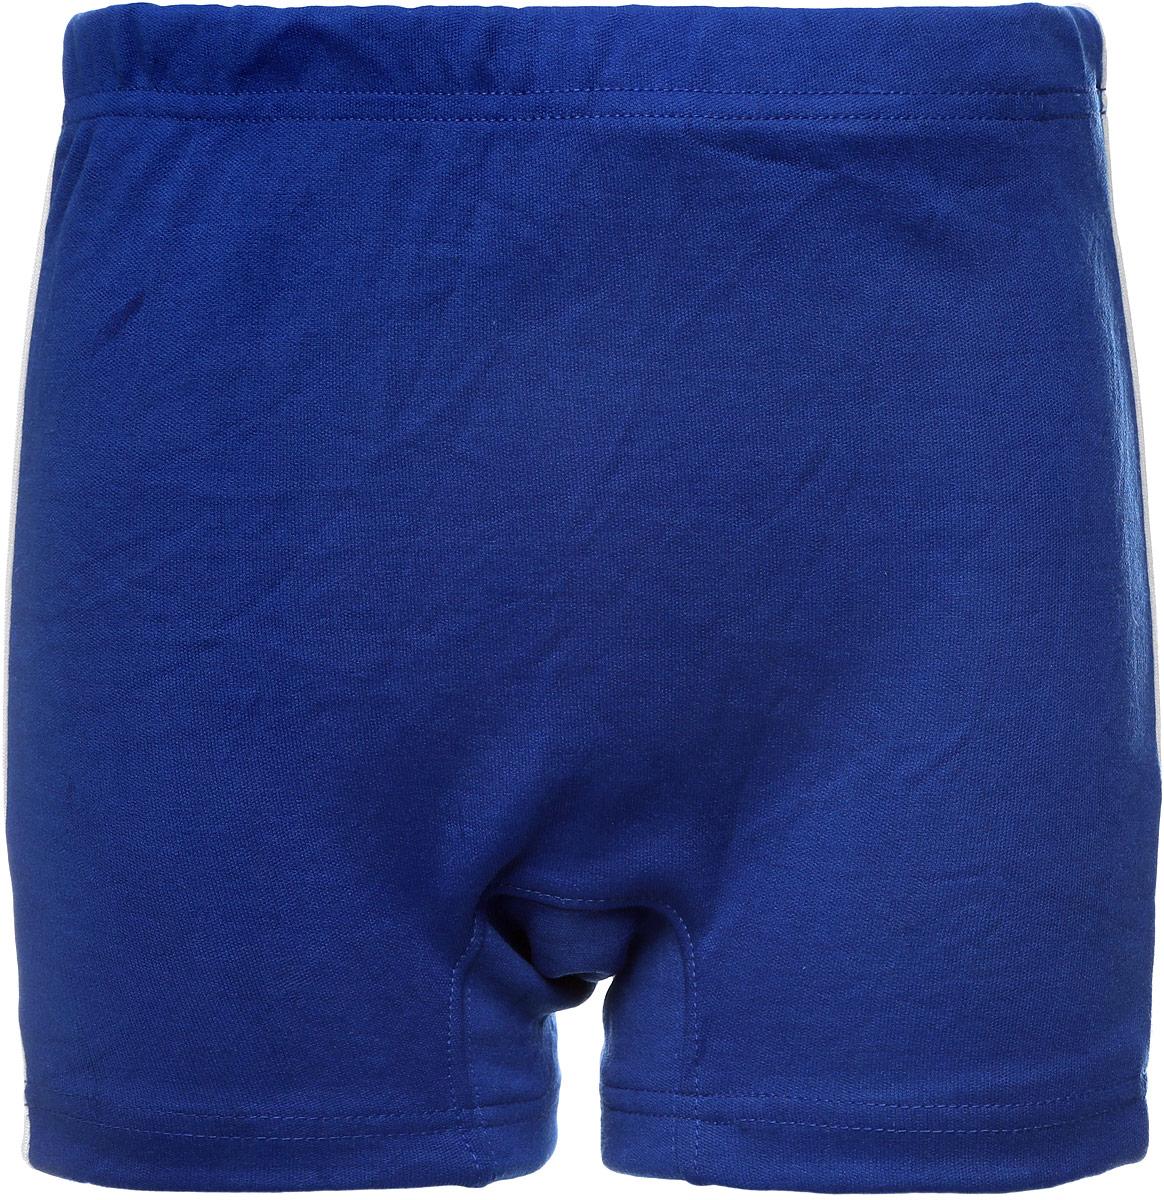 Шорты для самбо Green Hill, цвет: синий. SS2006246. Размер 3/160 (44-46)